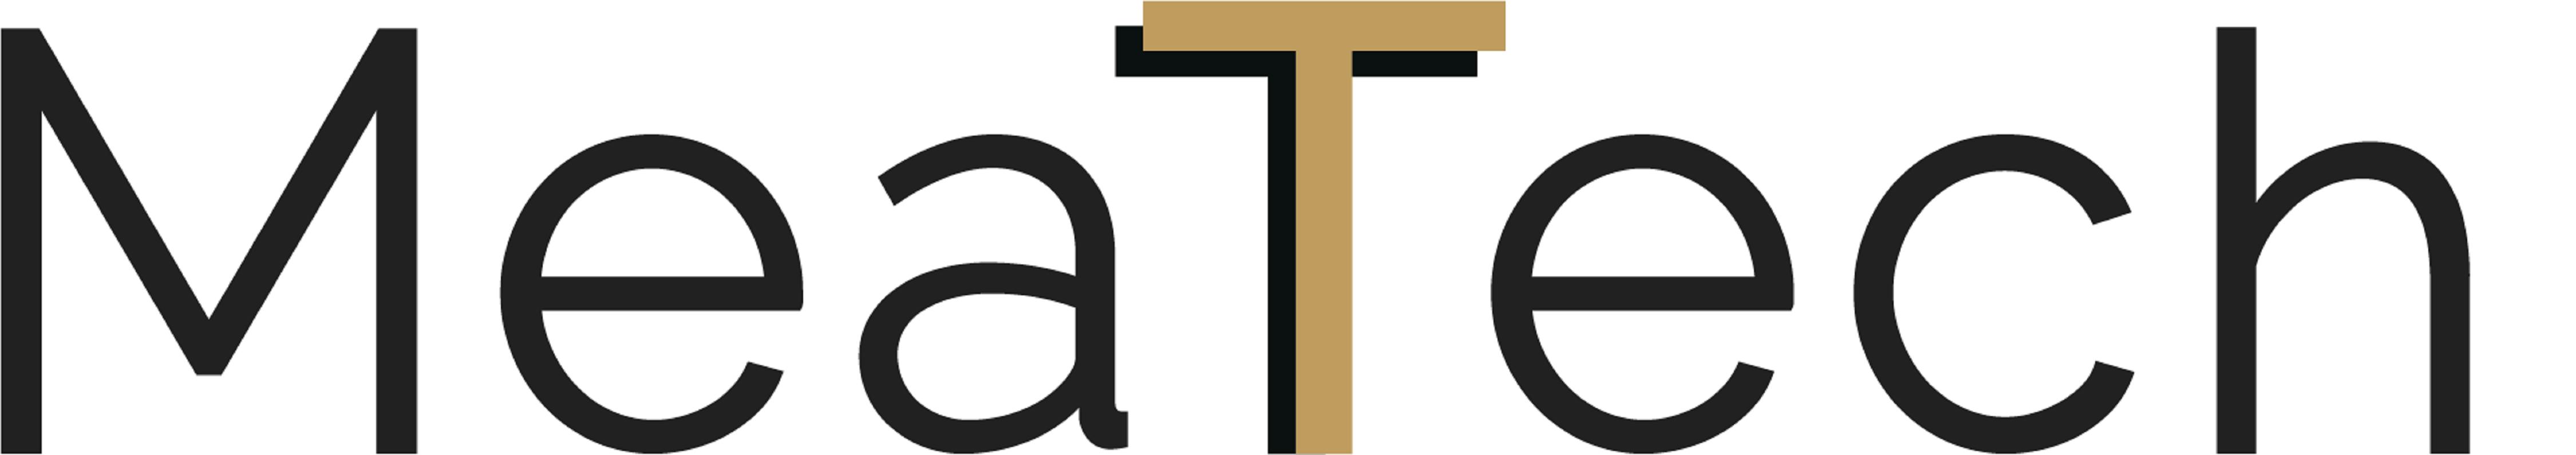 MITC logo